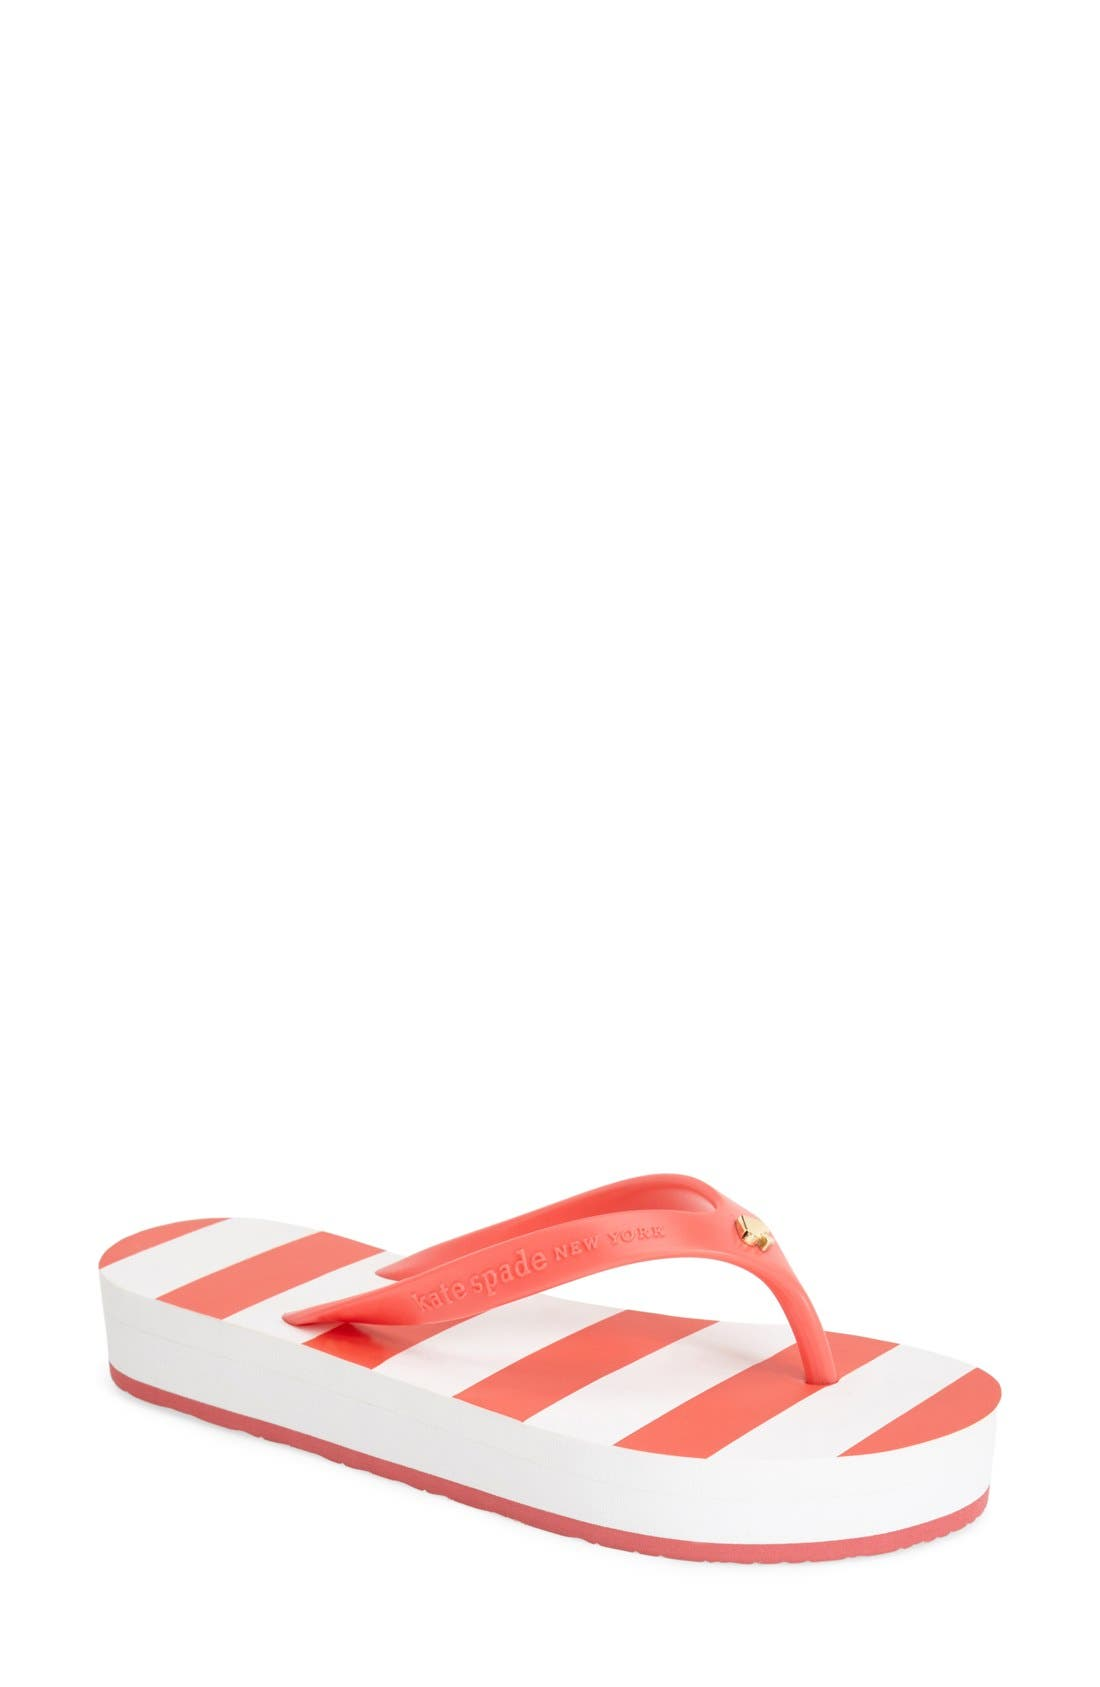 Main Image - kate spade new york 'fanlow' flip flop (Women)